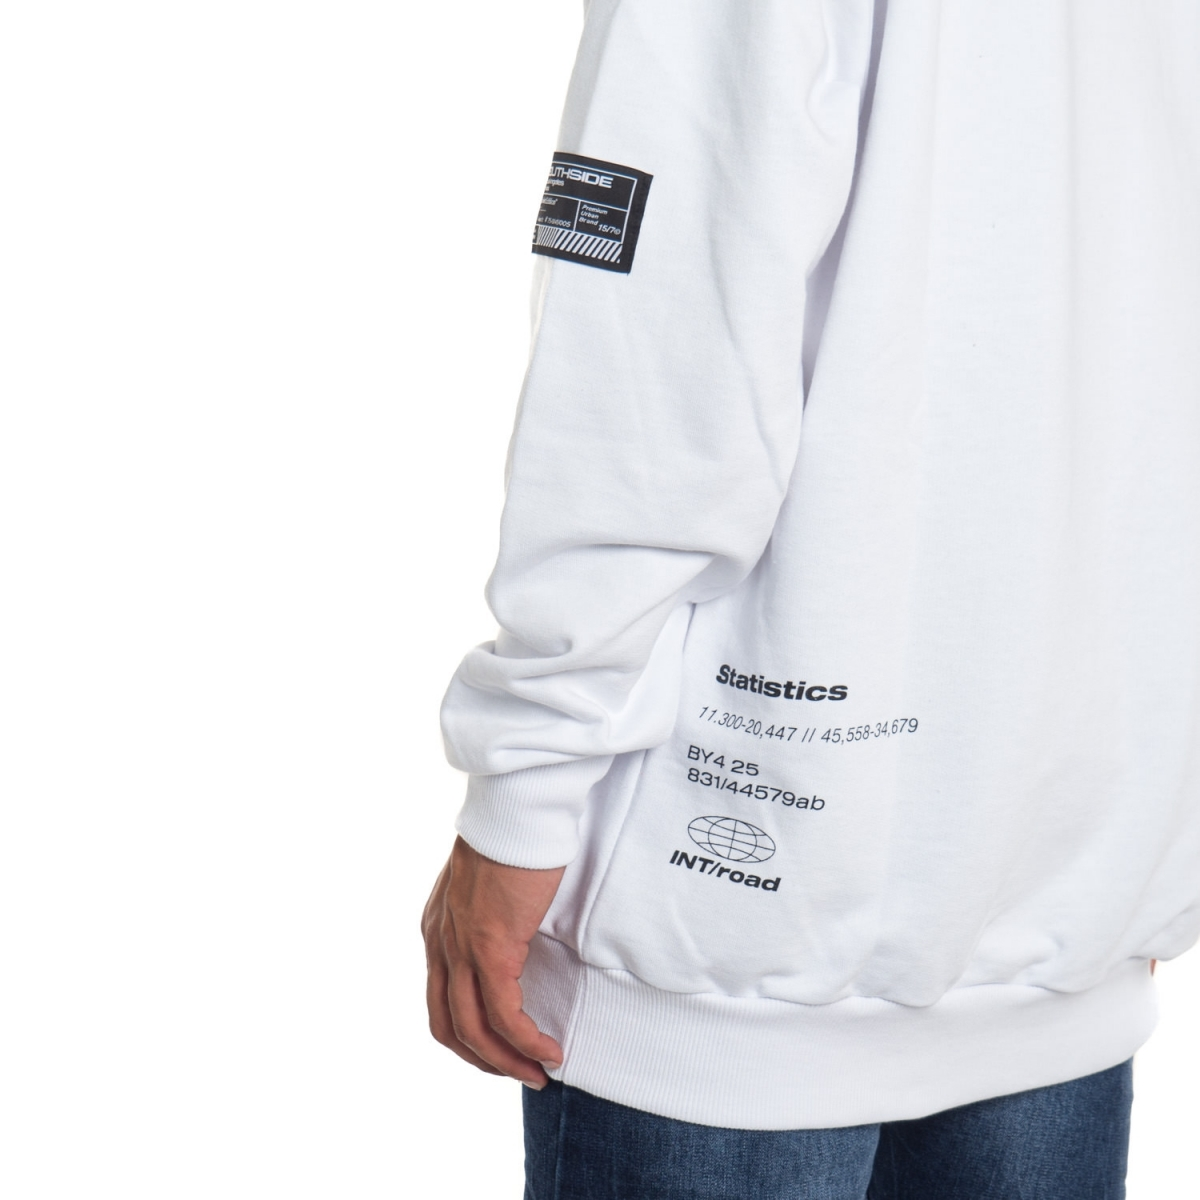 abbigliamento Felpe uomo Felpa con cappuccio SX20-16ST SOUTHSIDE Cafedelmar Shop